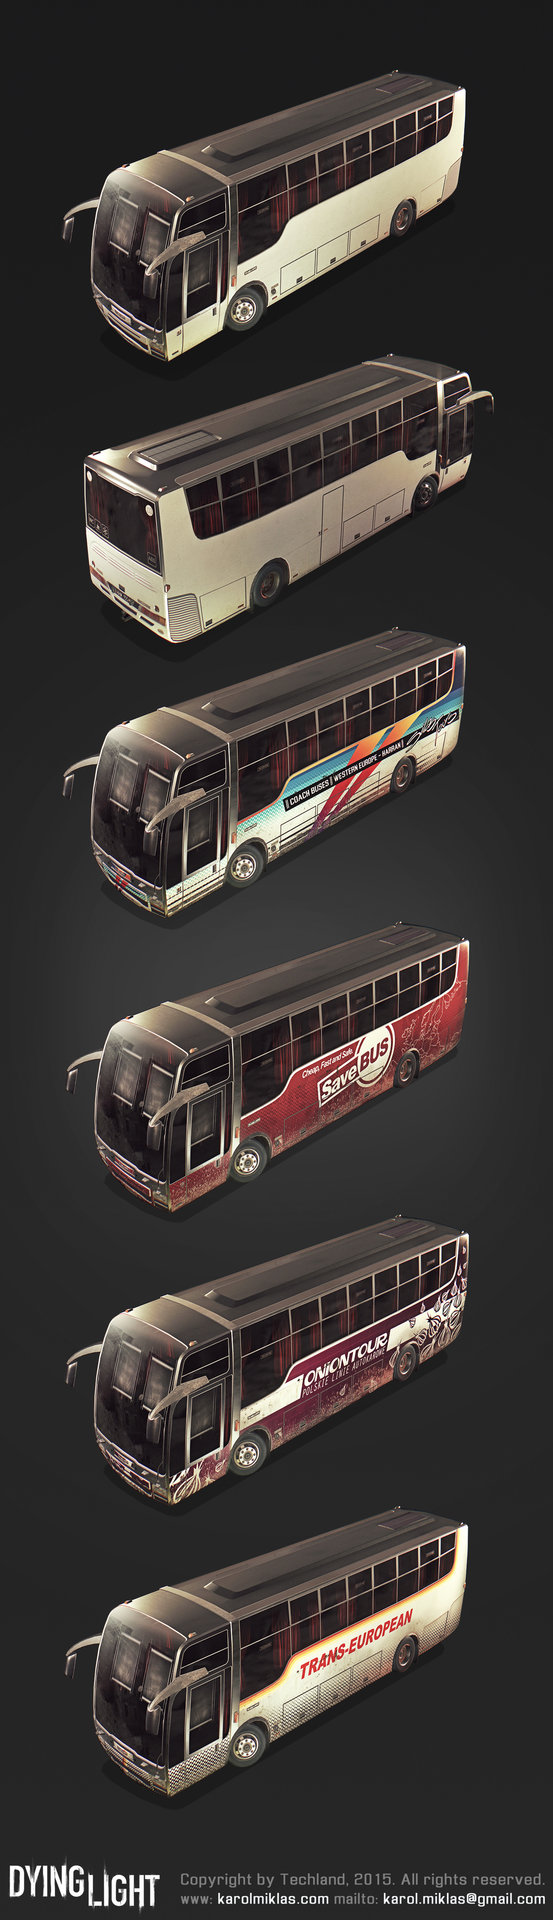 karol-miklas-new-bus-a-1.jpg